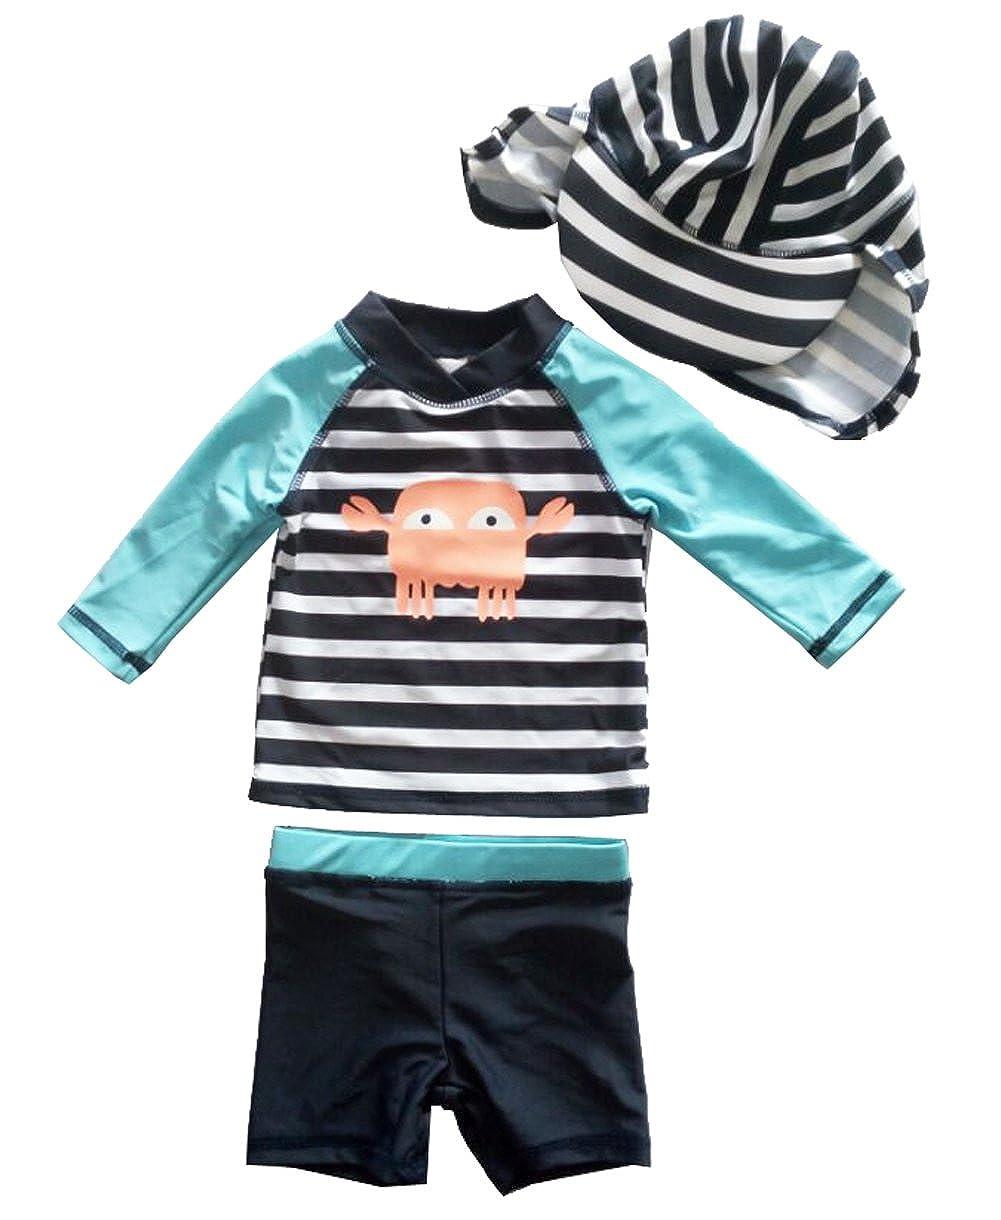 Baby Boys Rash Guard Swimsuit Striped Swimwear Shirt+Bottom Set